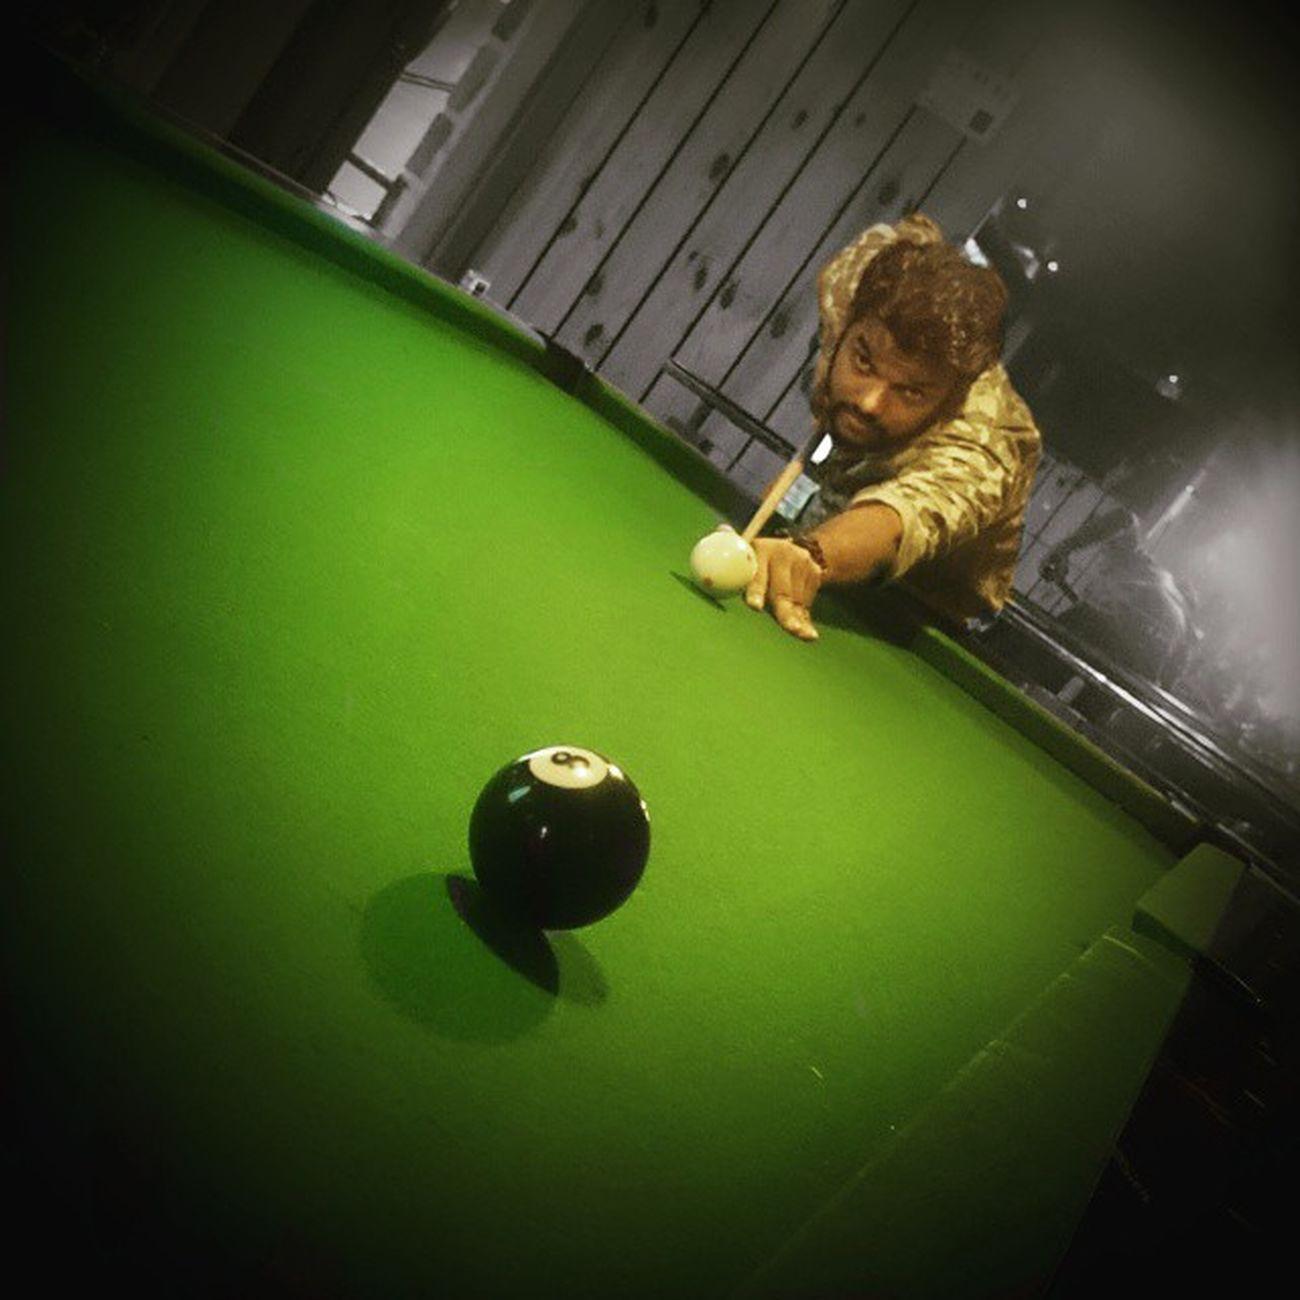 Pool 8ballpool Instapic Taprestobarmumbai